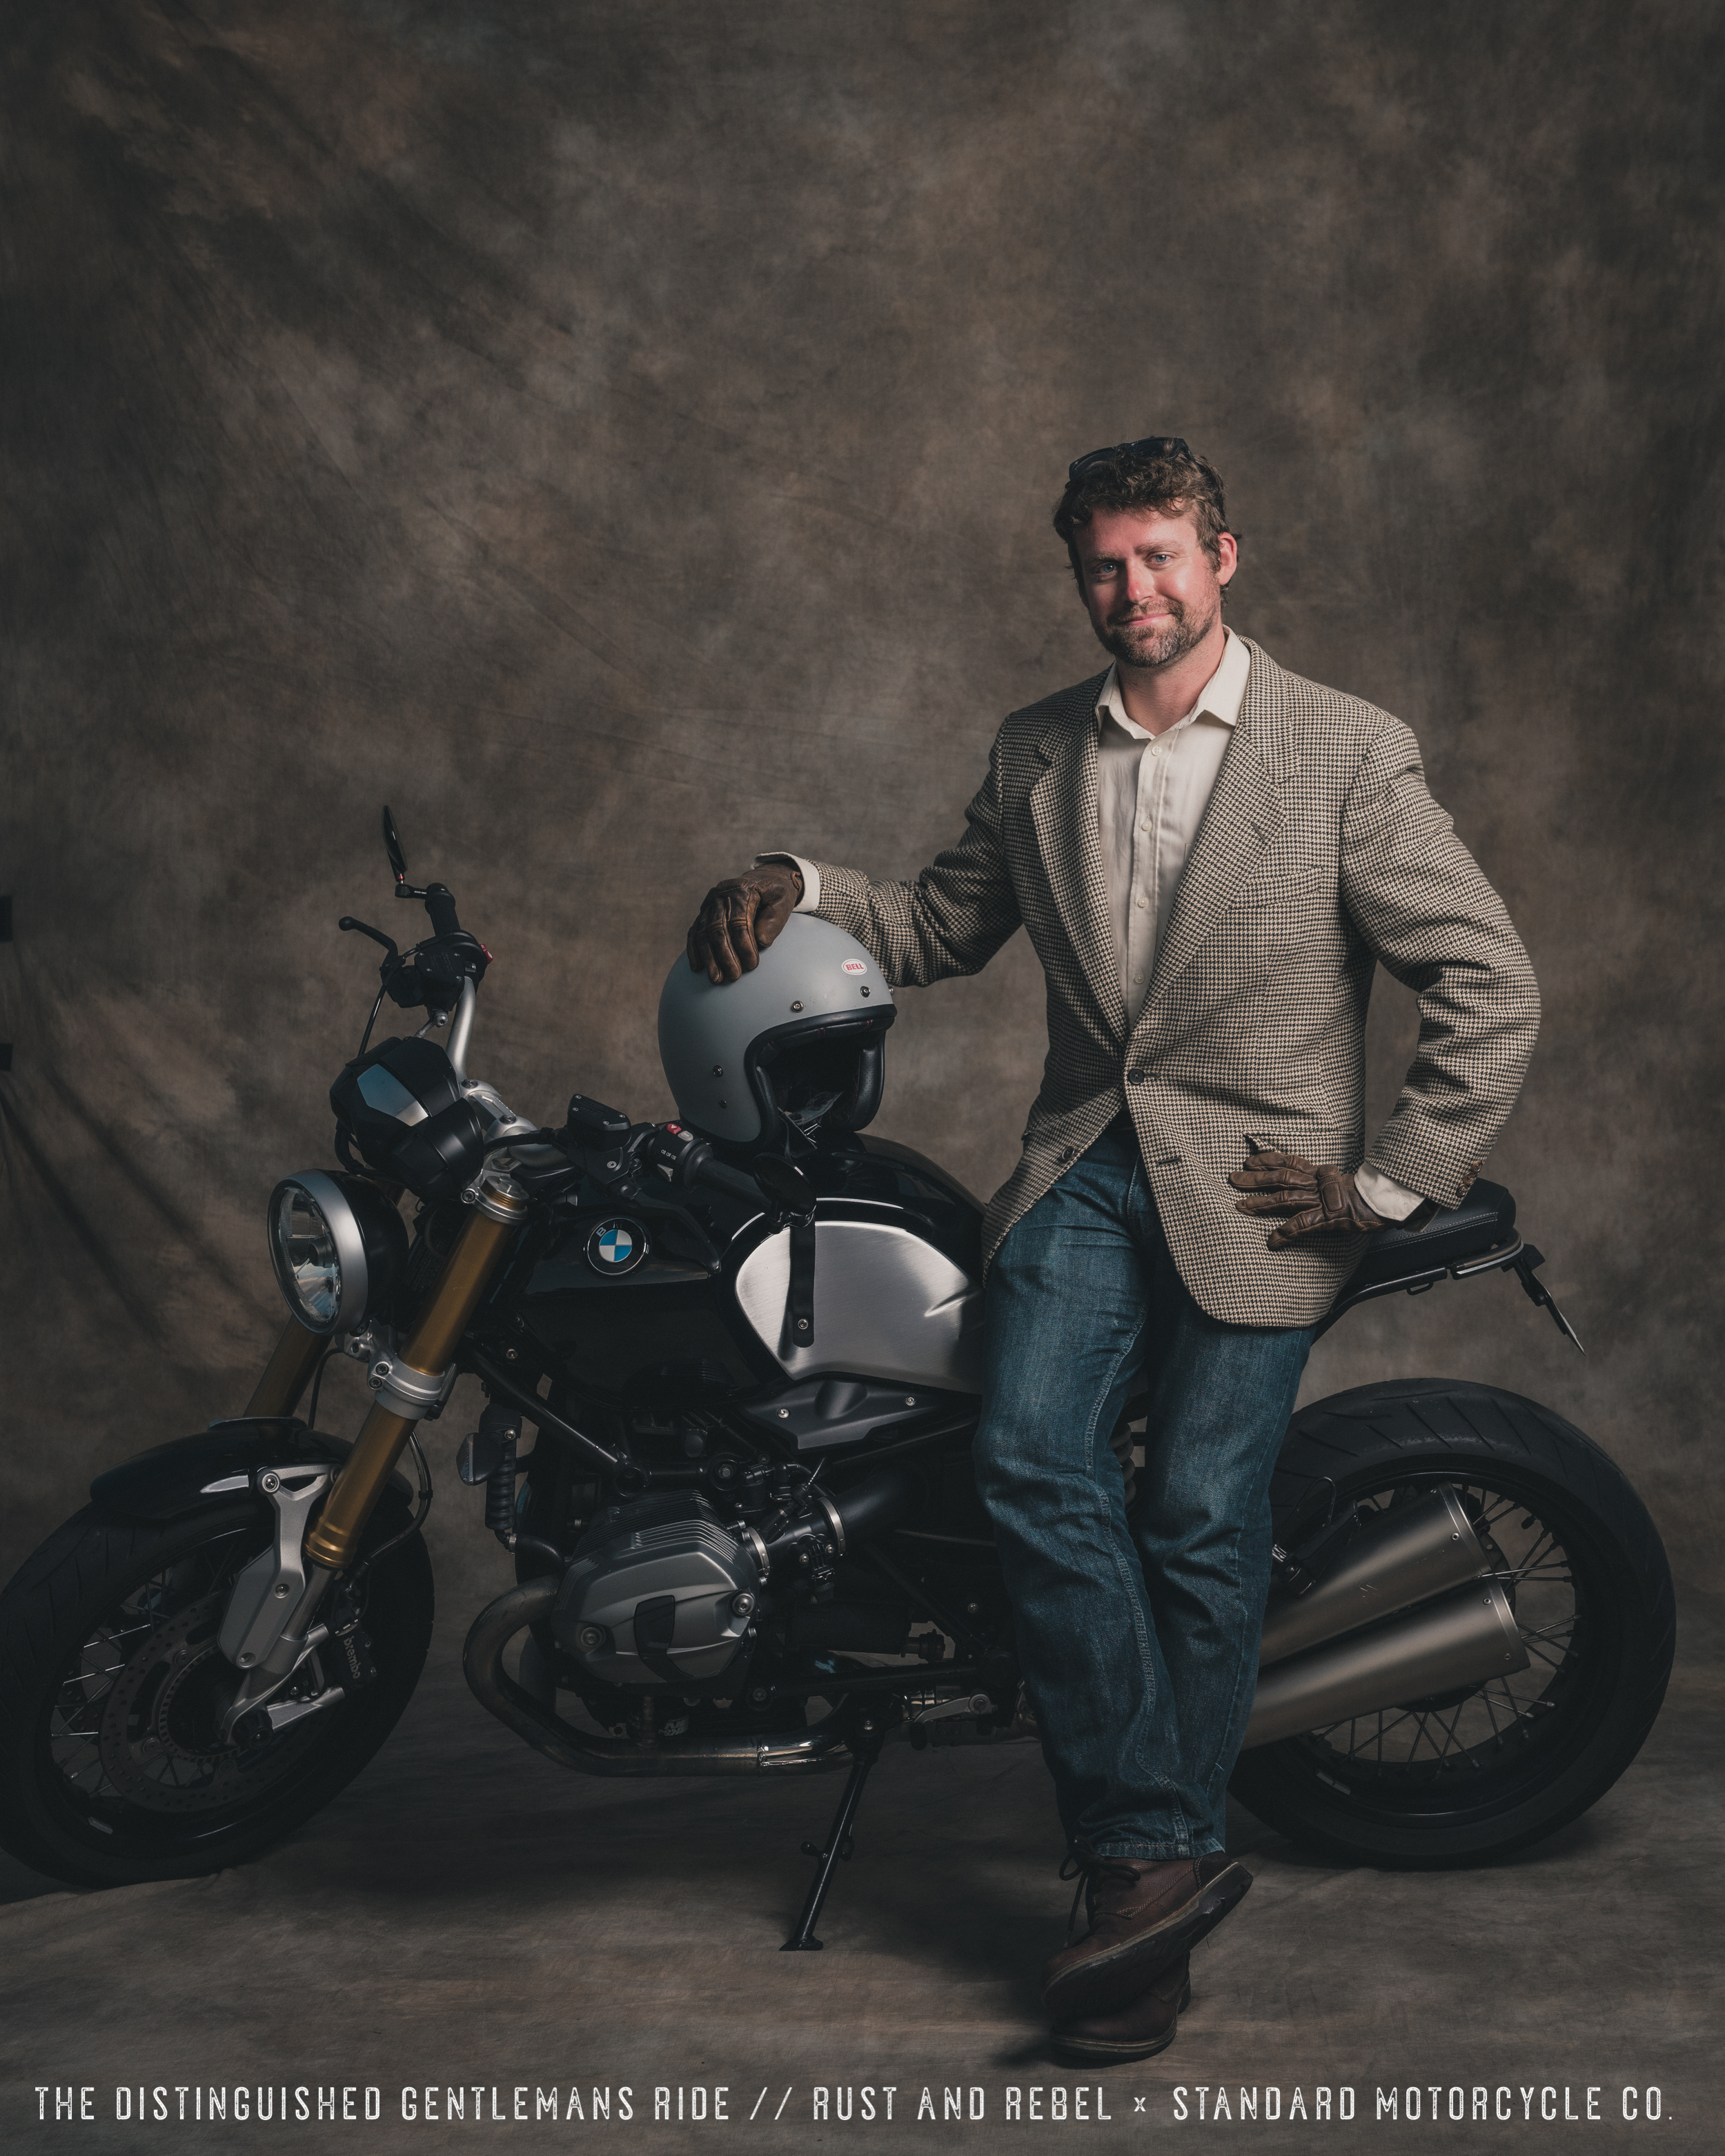 The Distinguished Gentleman's Ride 2019 [PEOPLE - PHOTO BY @MIKEDUNNUSA] - 0140.jpg